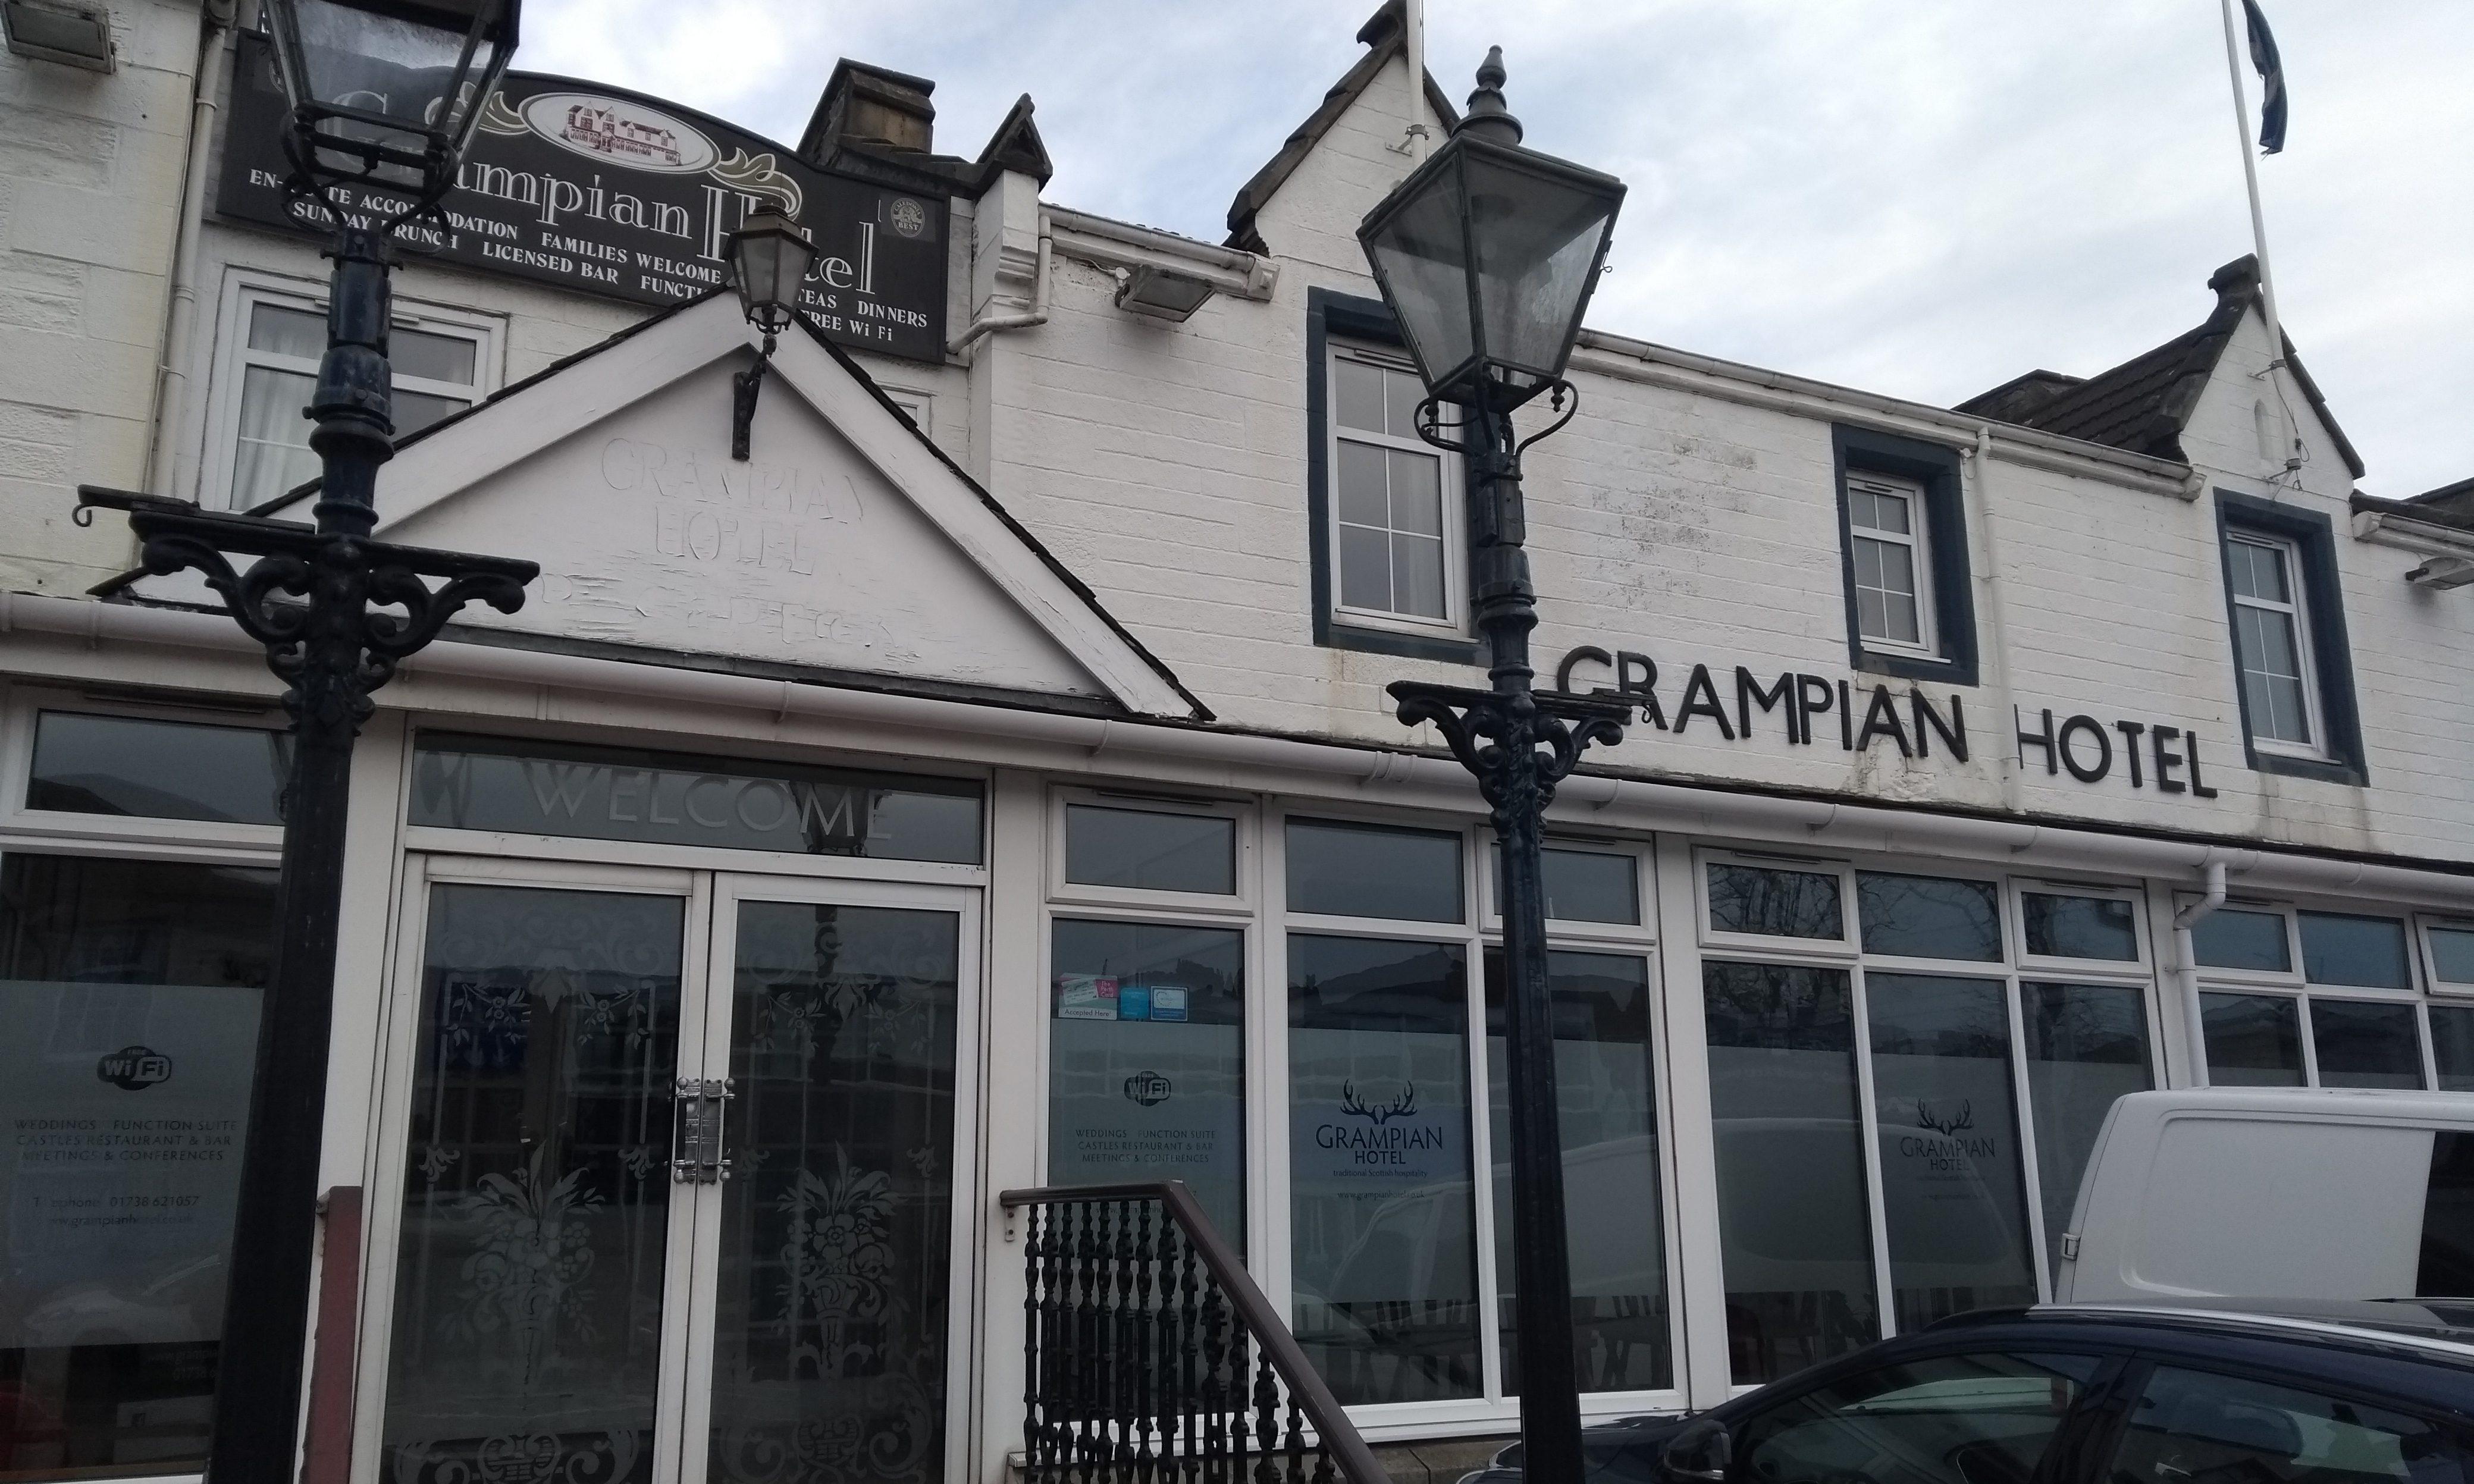 The Grampian Hotel in Perth